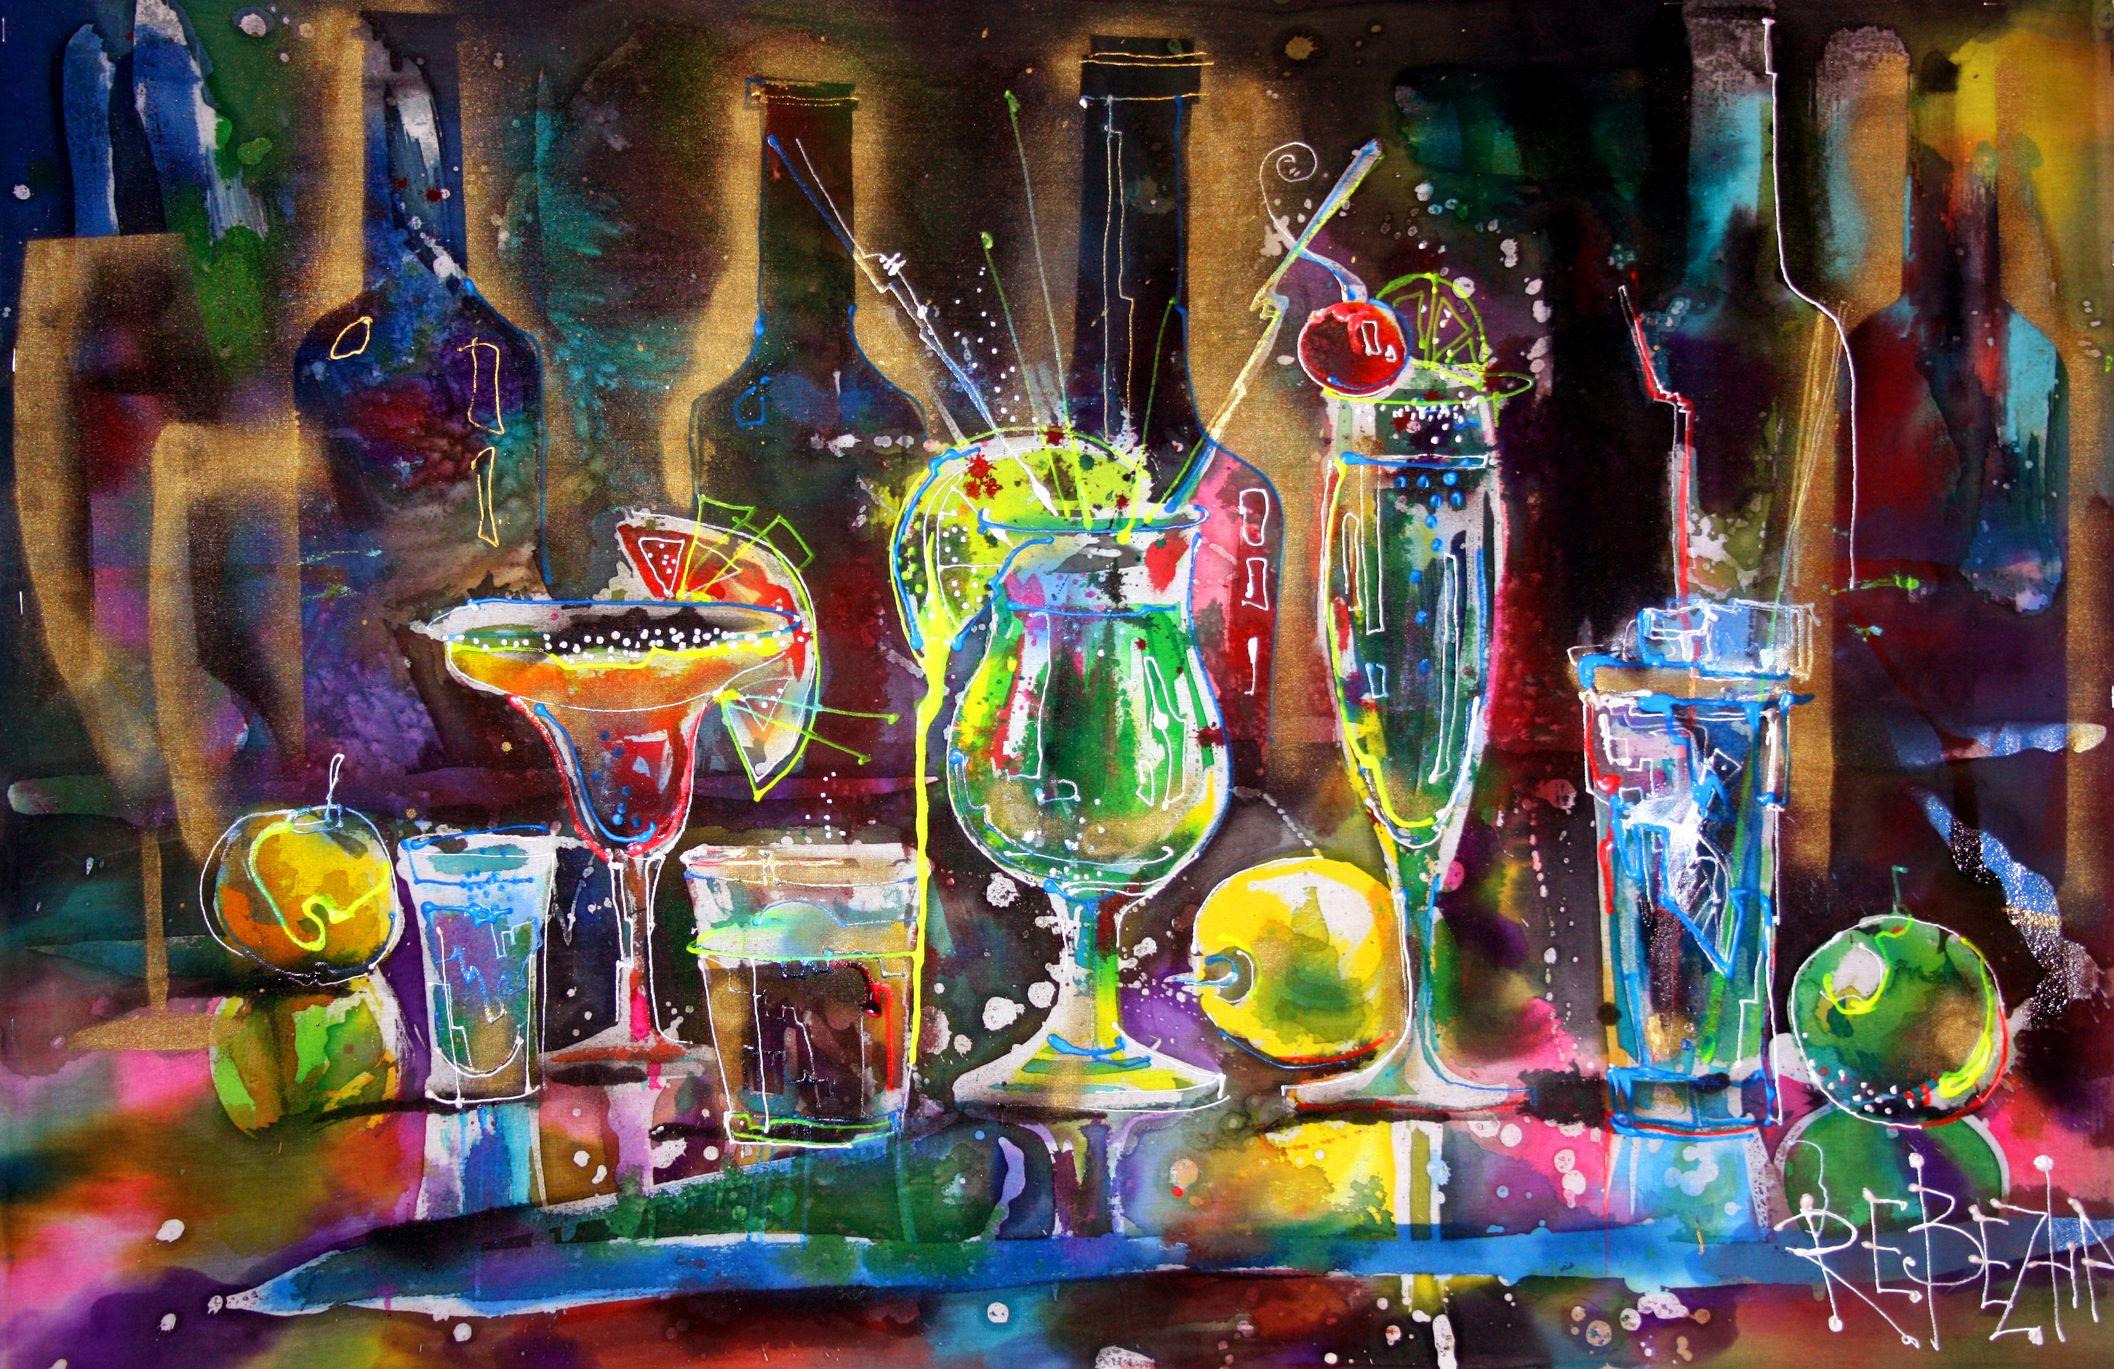 image: Paintings by Ekaterina Rebezha